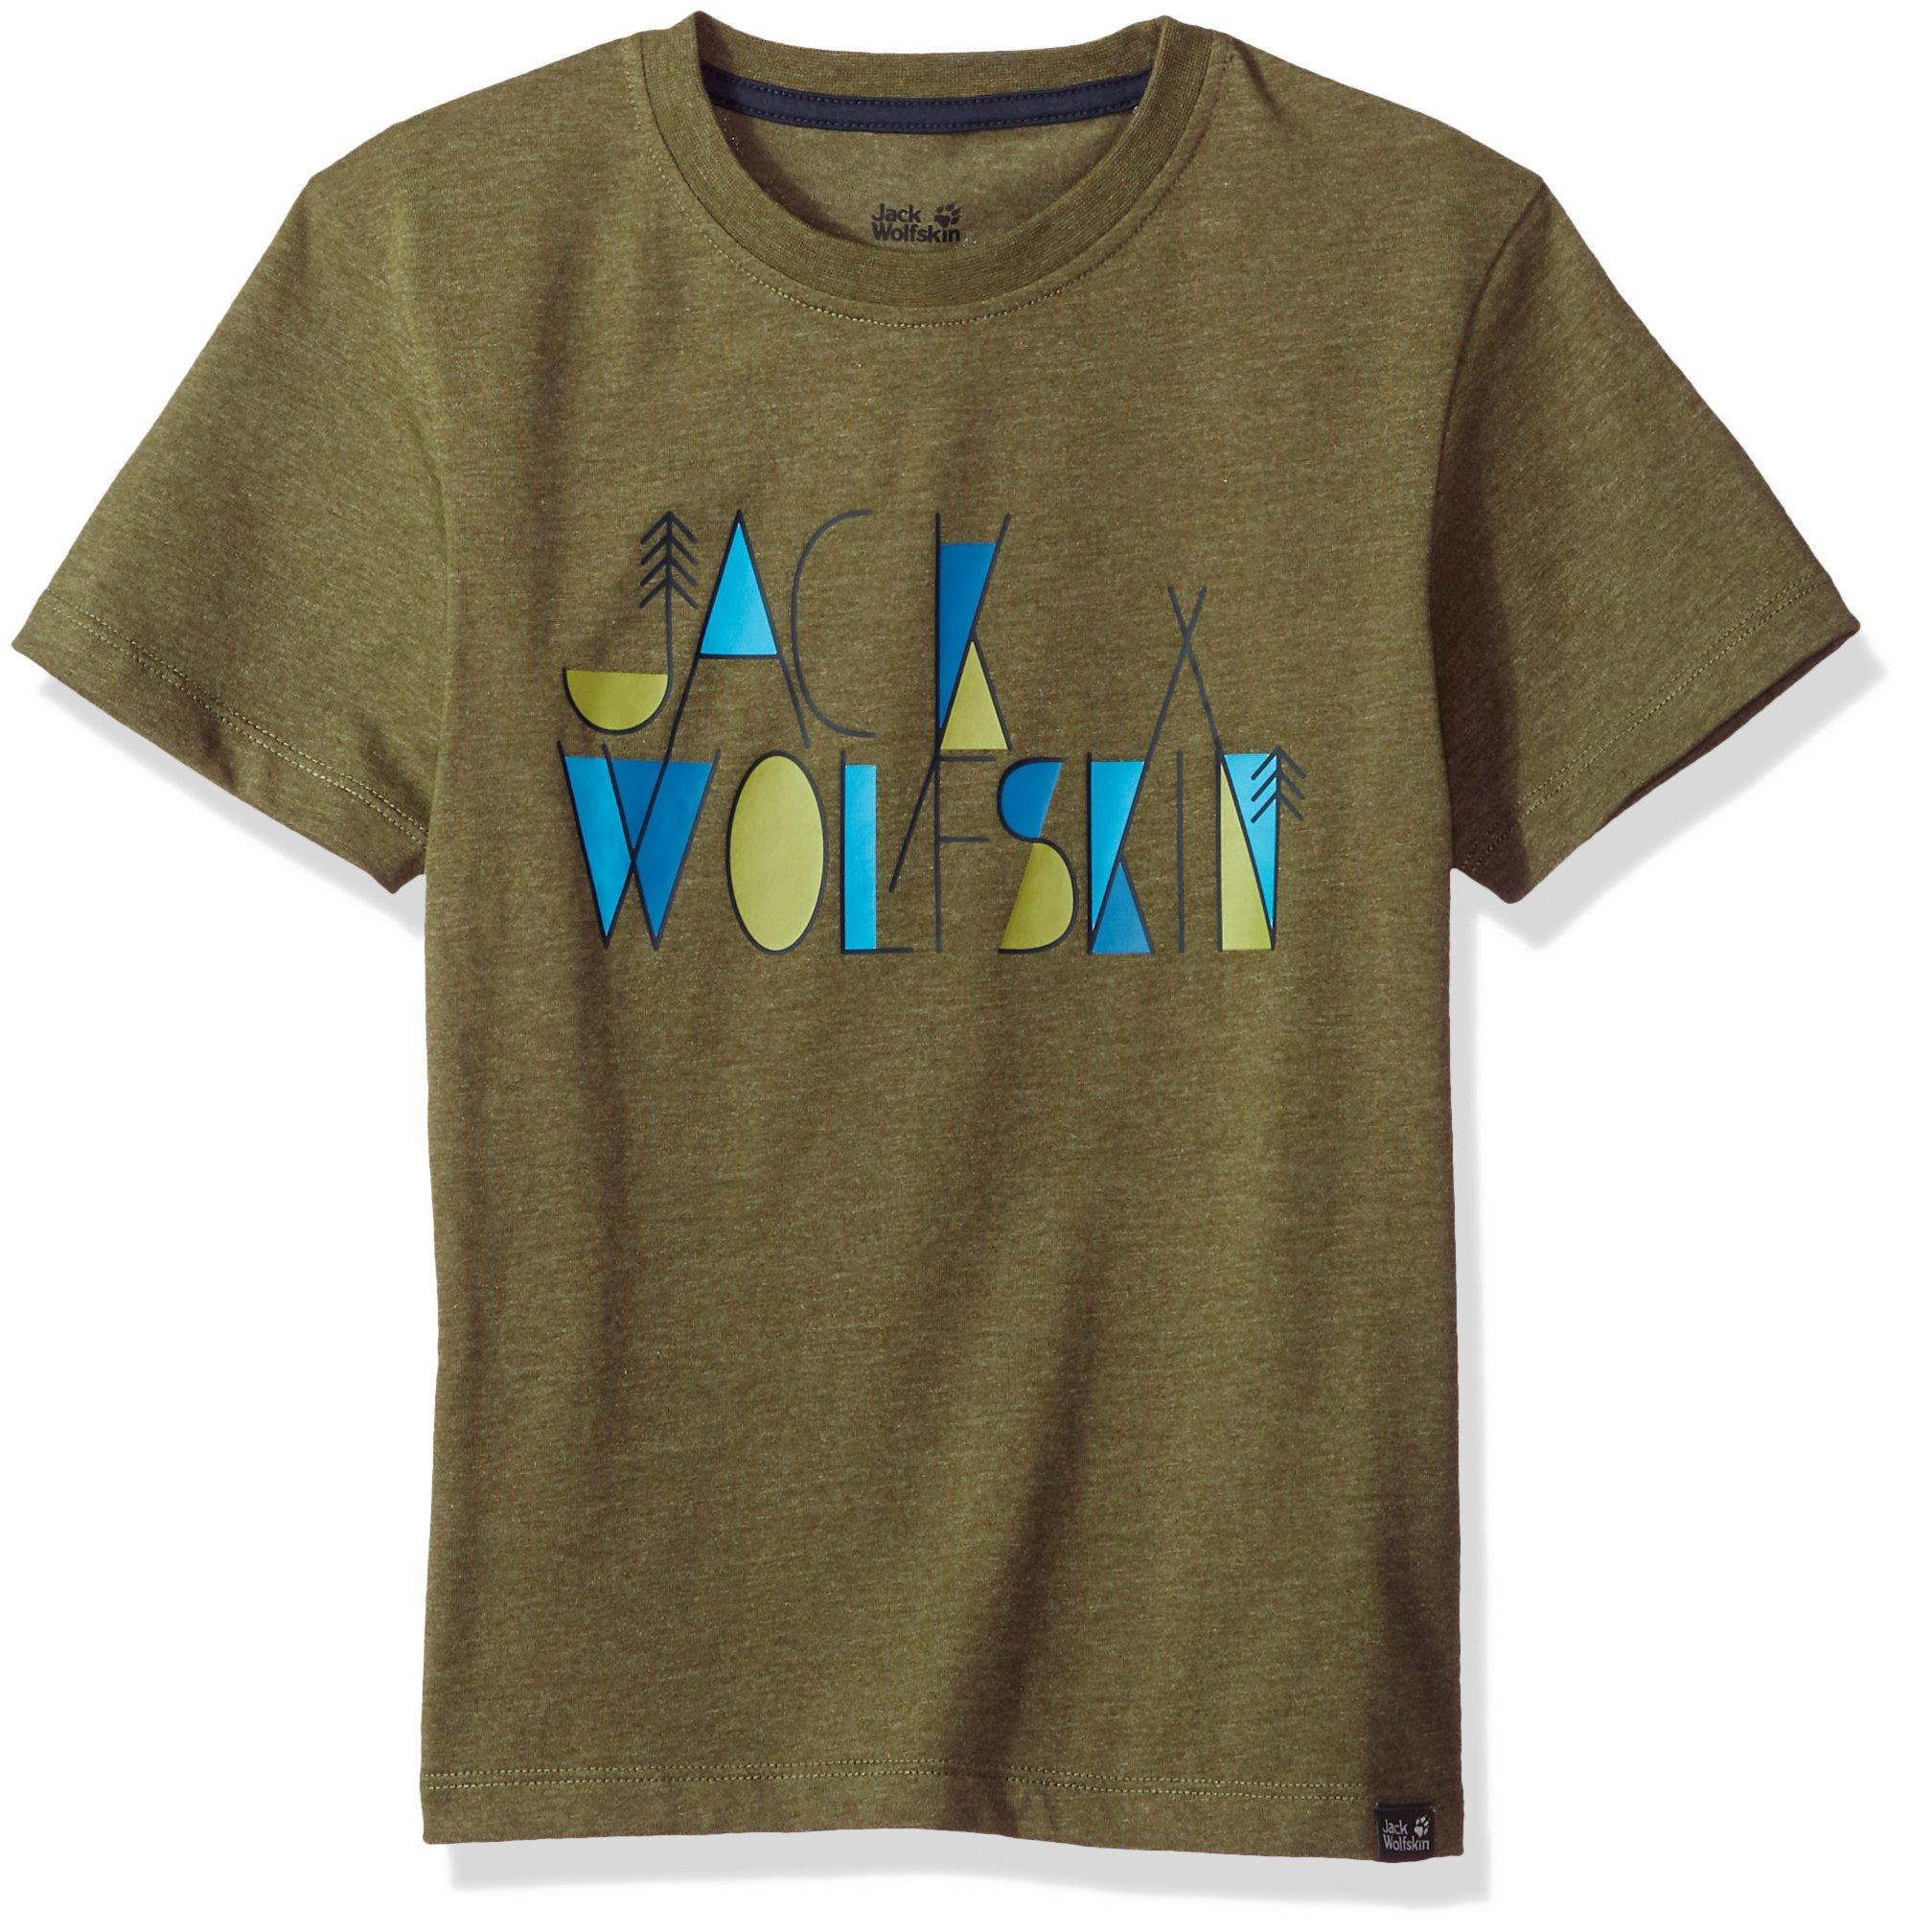 Jack Wolfskin Boy's Brand T T-Shirt Short Sleeve, 176 (14 Years & Older), Woodland Green